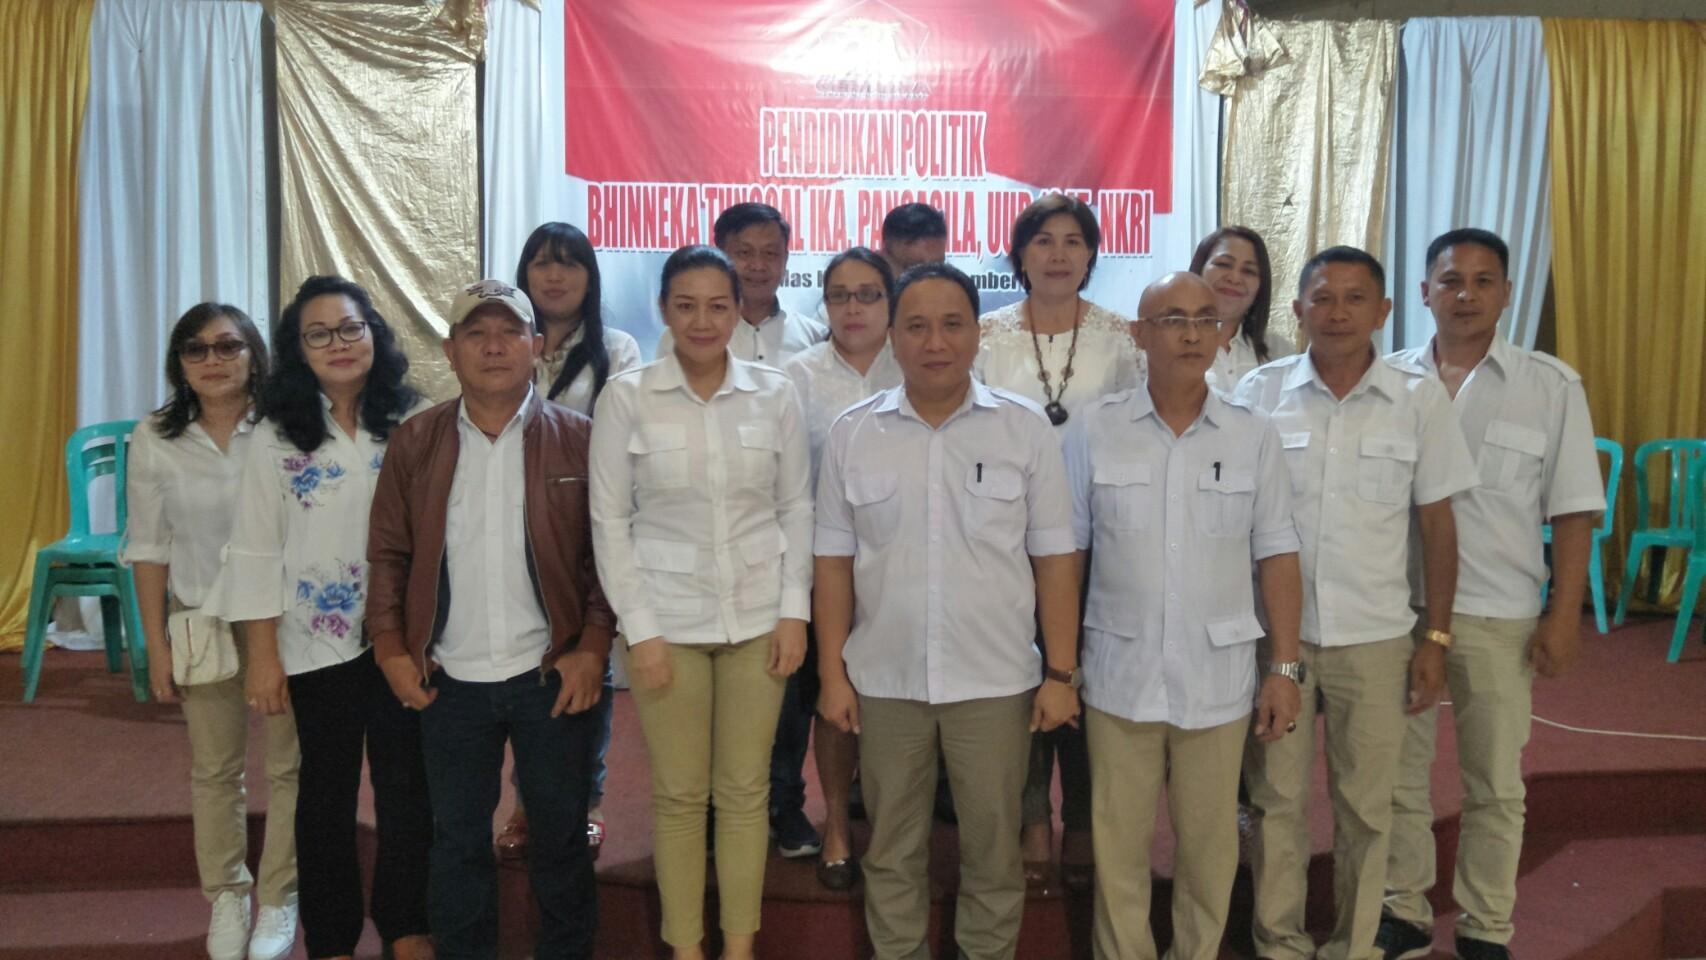 Perkuat Komitmen 4 Pilar Kebangsaan, Gerindra Tomohon Gelar Pendidikan Politik